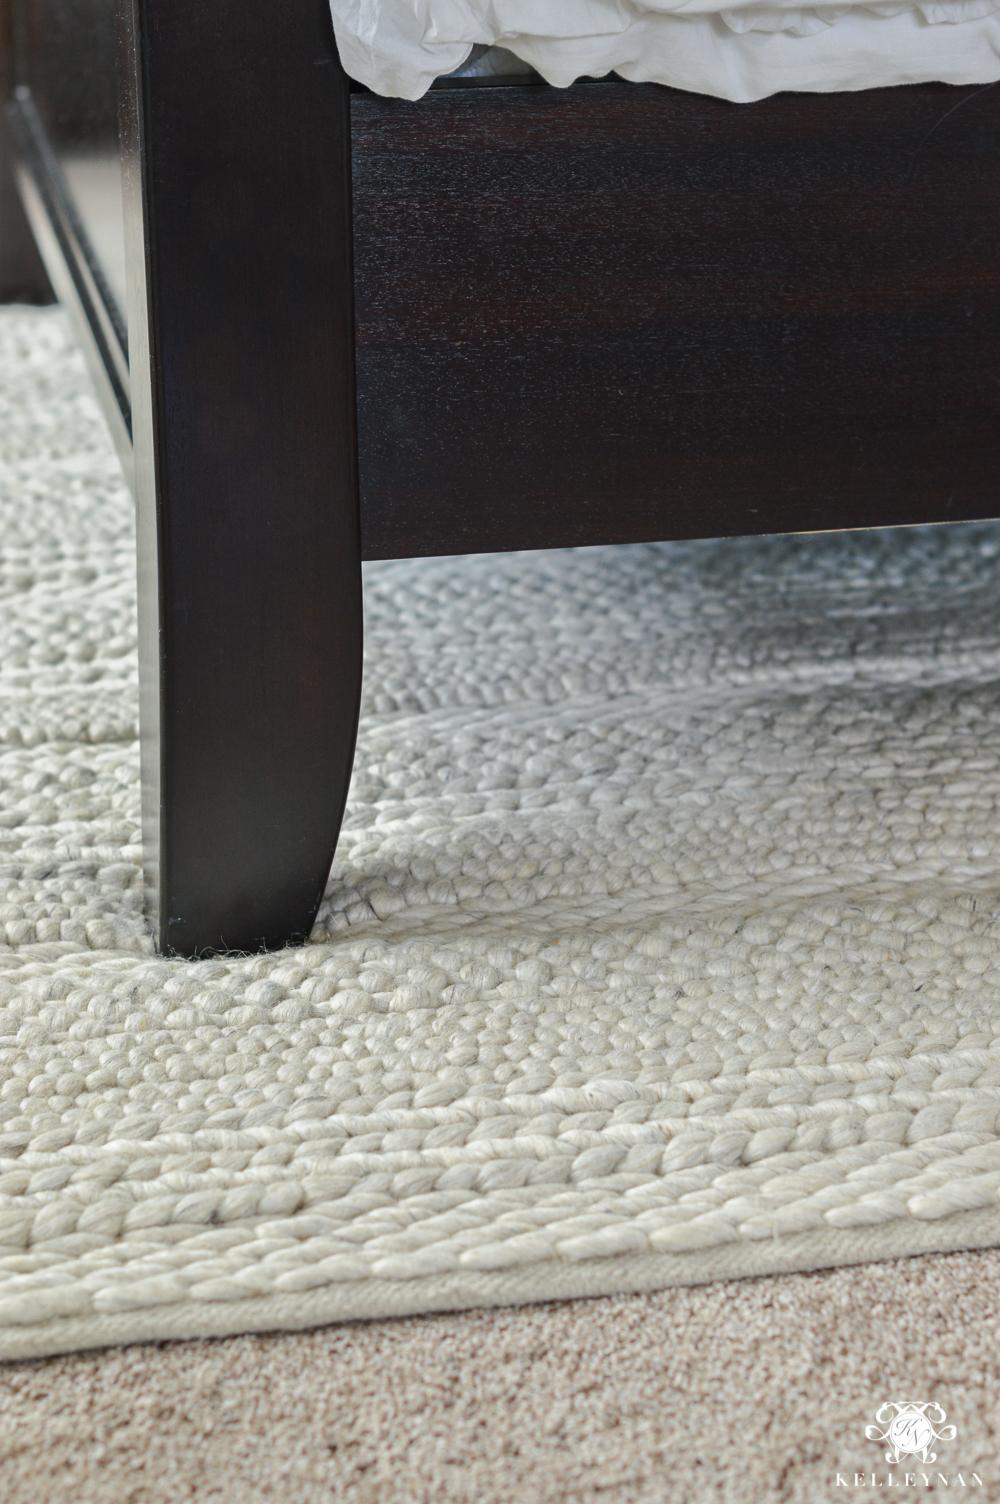 Fullsize Of Rug Under Bed